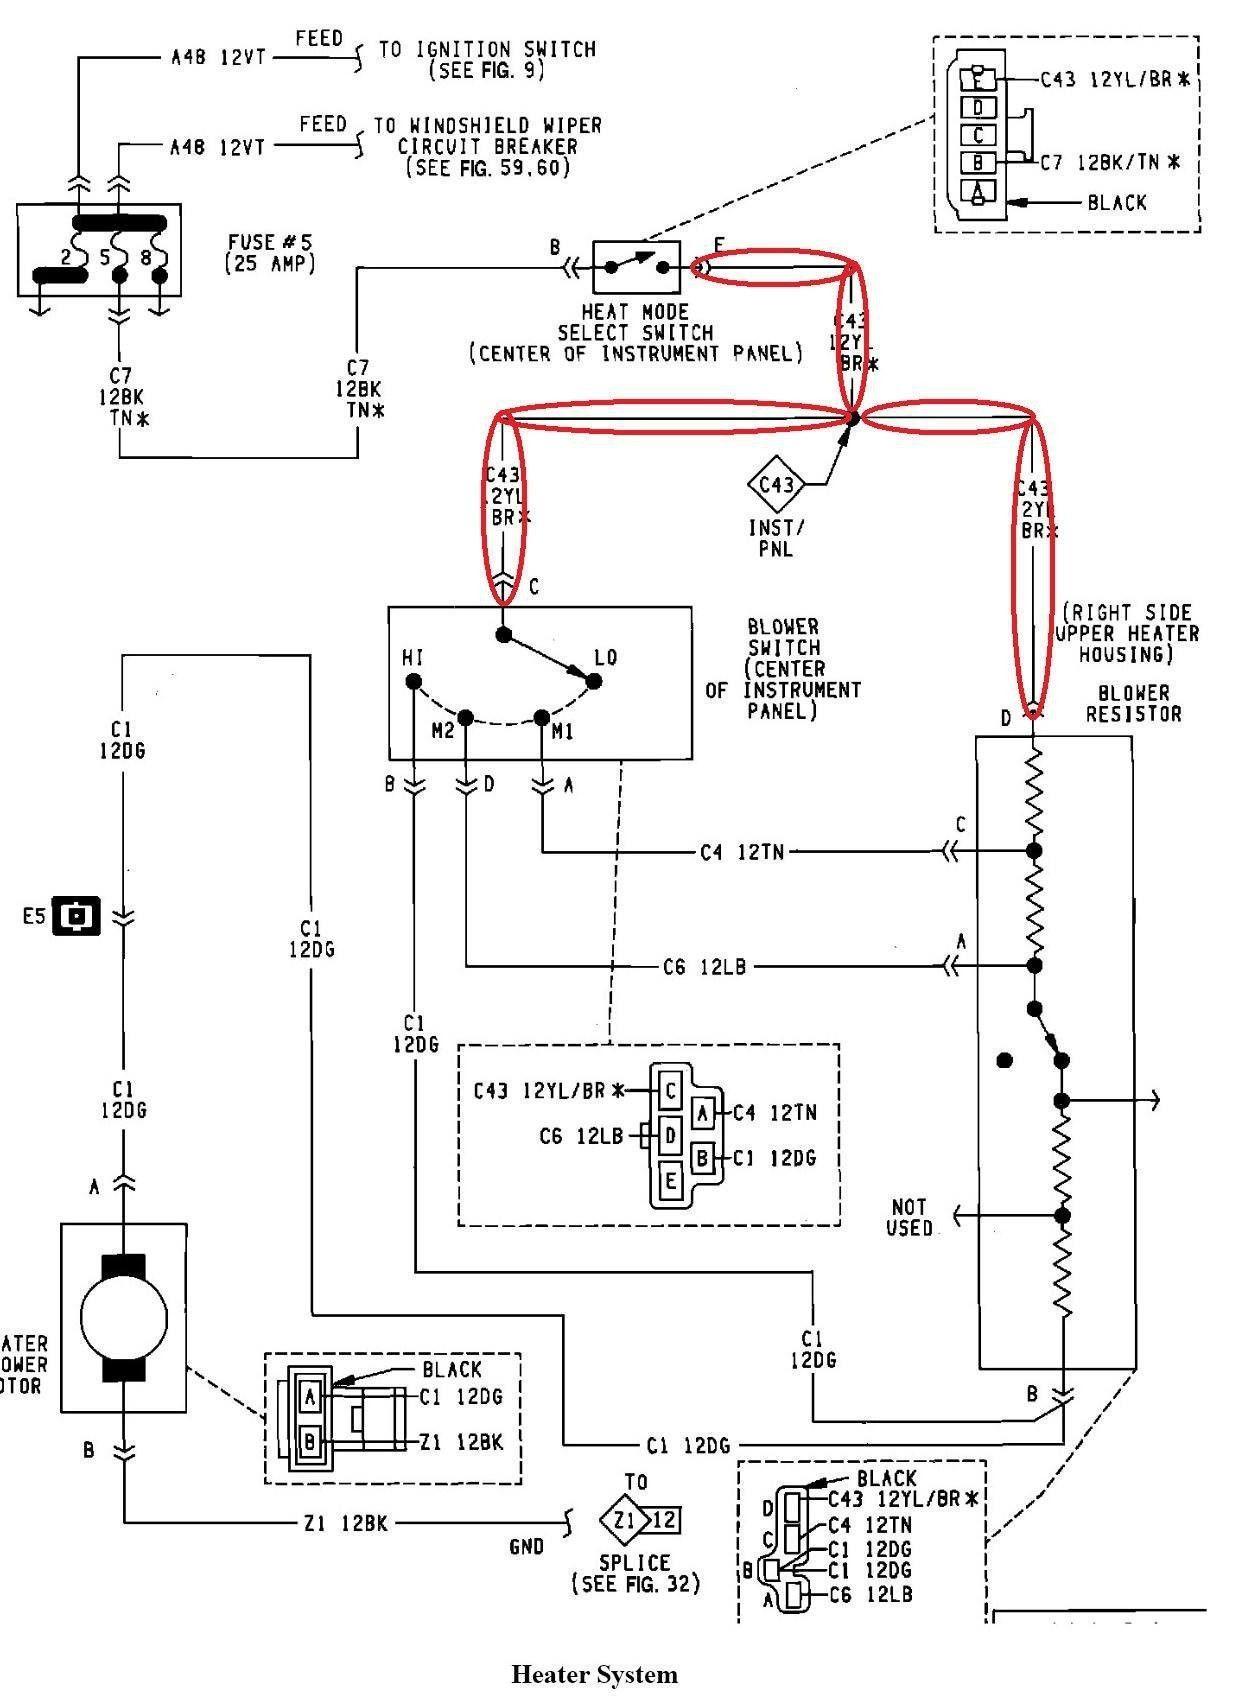 36 volt ez go golf cart wiring diagram Collection - Ezgo Txt 36 Volt Wiring  Diagram New Battery Wiring Diagram For… in 2020 | Ezgo golf cart, Club car  golf cart, Golf cartsPinterest